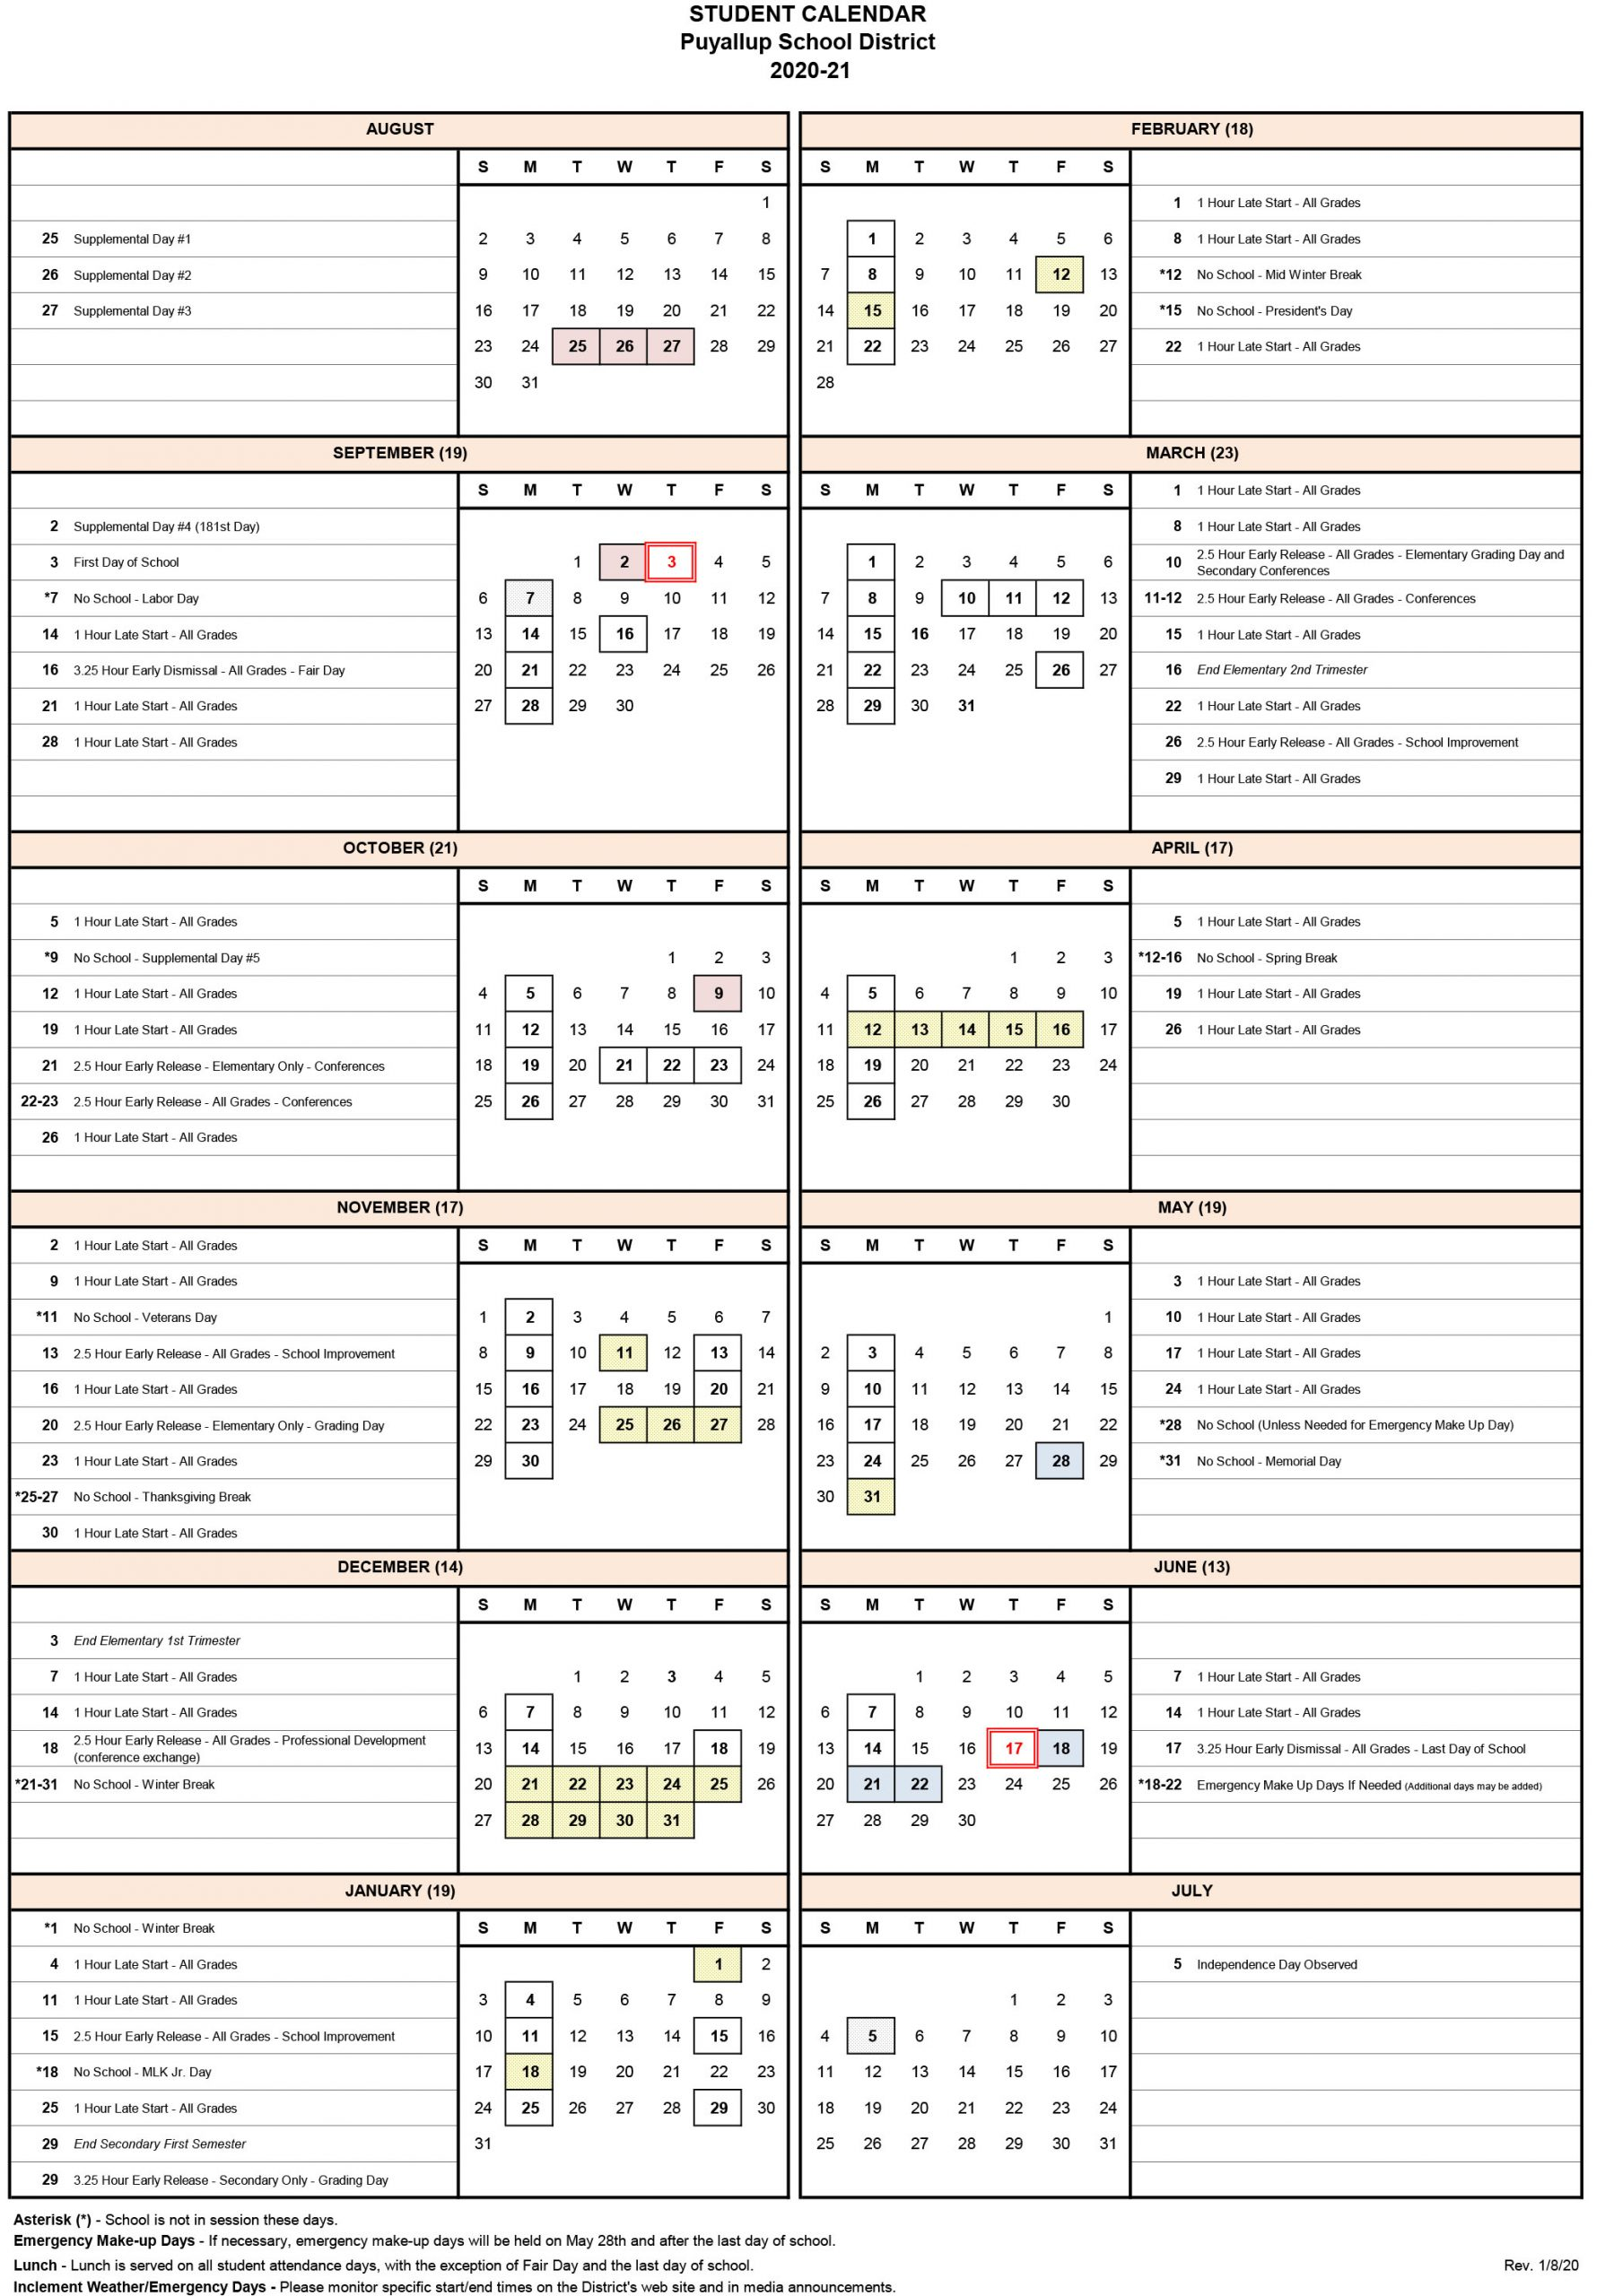 Ny Times Editorial Calendar   Printable Calendar 2020 2021 With Regard To Turningstone Bingo Schedule Feb 2020